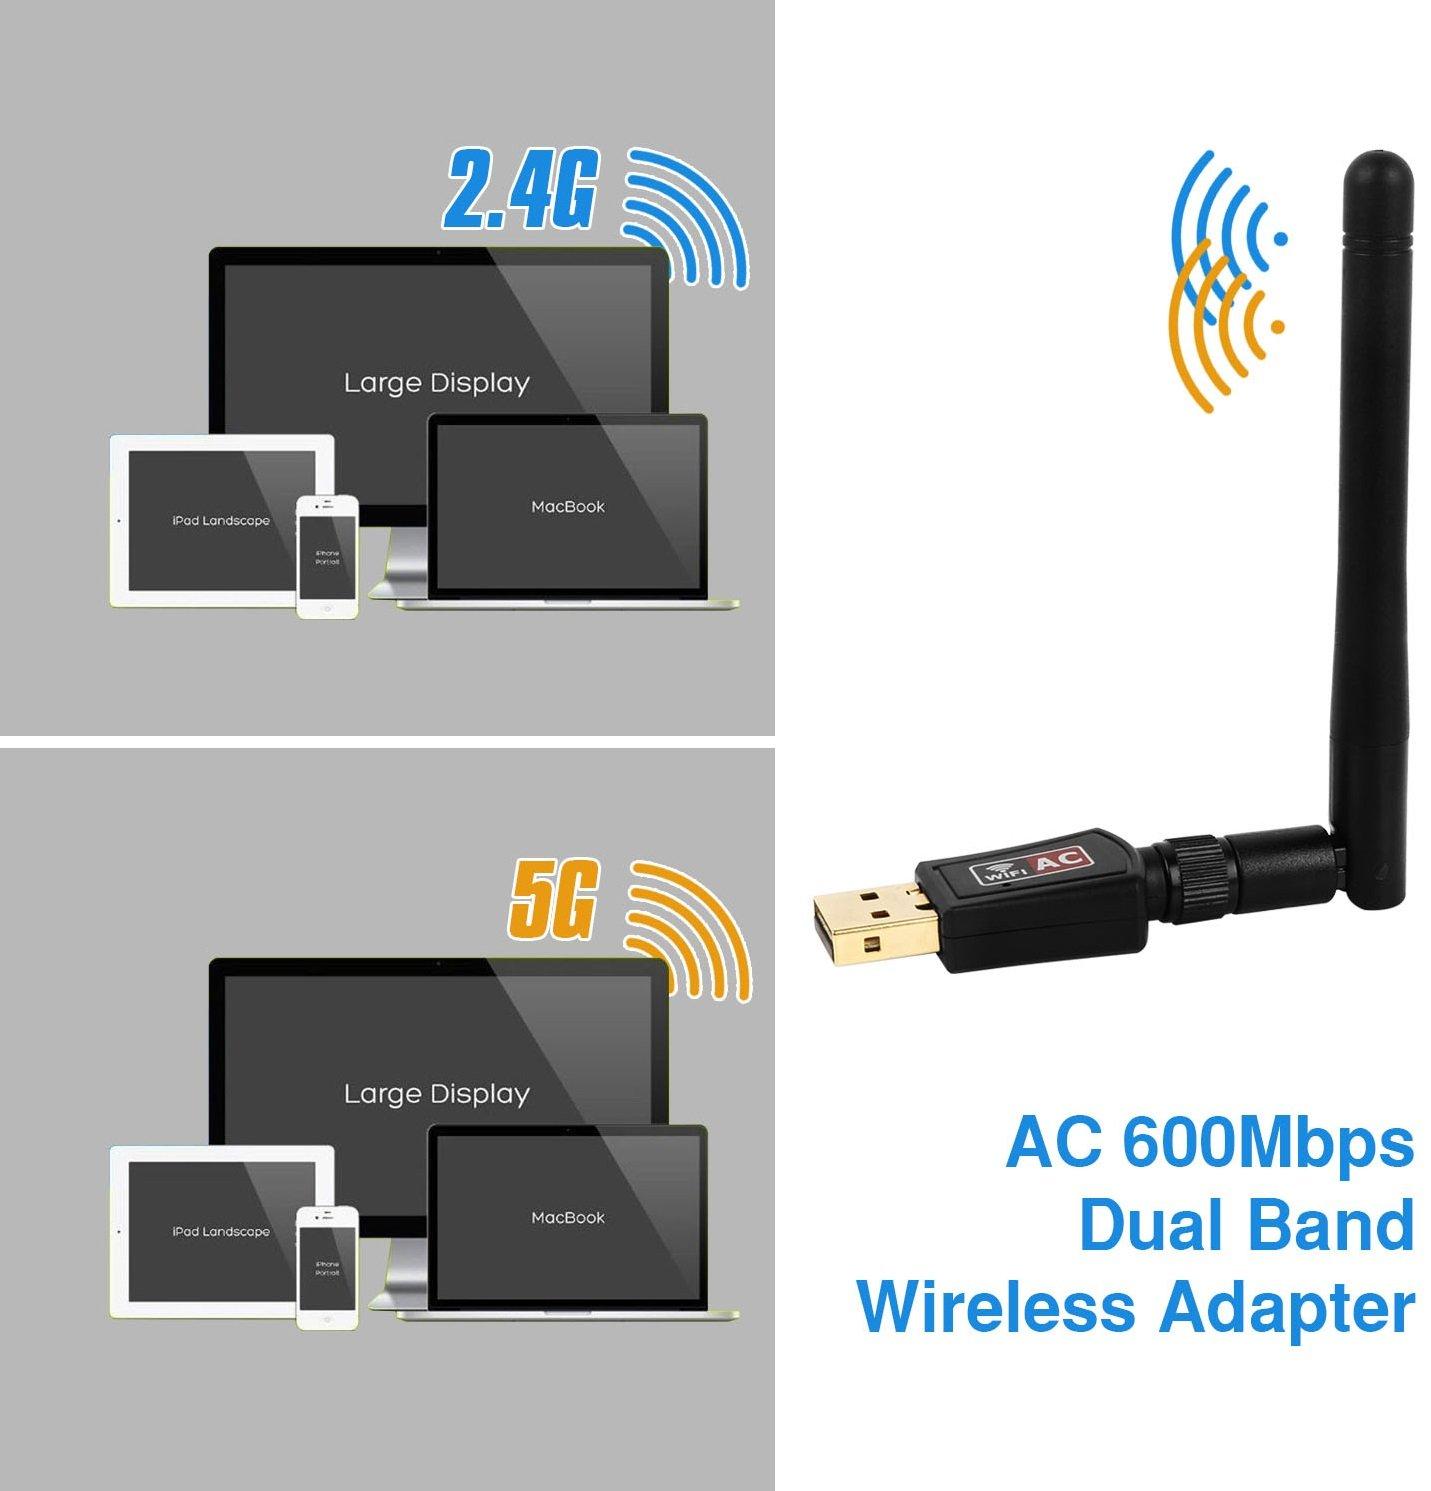 iMounTek 600 Mbps Dual Band (2.4GHz/150Mbps+5GHz/433Mbps) WiFi Adapter Wireless USB Dongle. 802.11G/N/B High Gain Antenna Network Lan Card- Desktop/Laptop/PC Windows 10/8/8.1/7/XP/Vista/MAC OS/LINUX